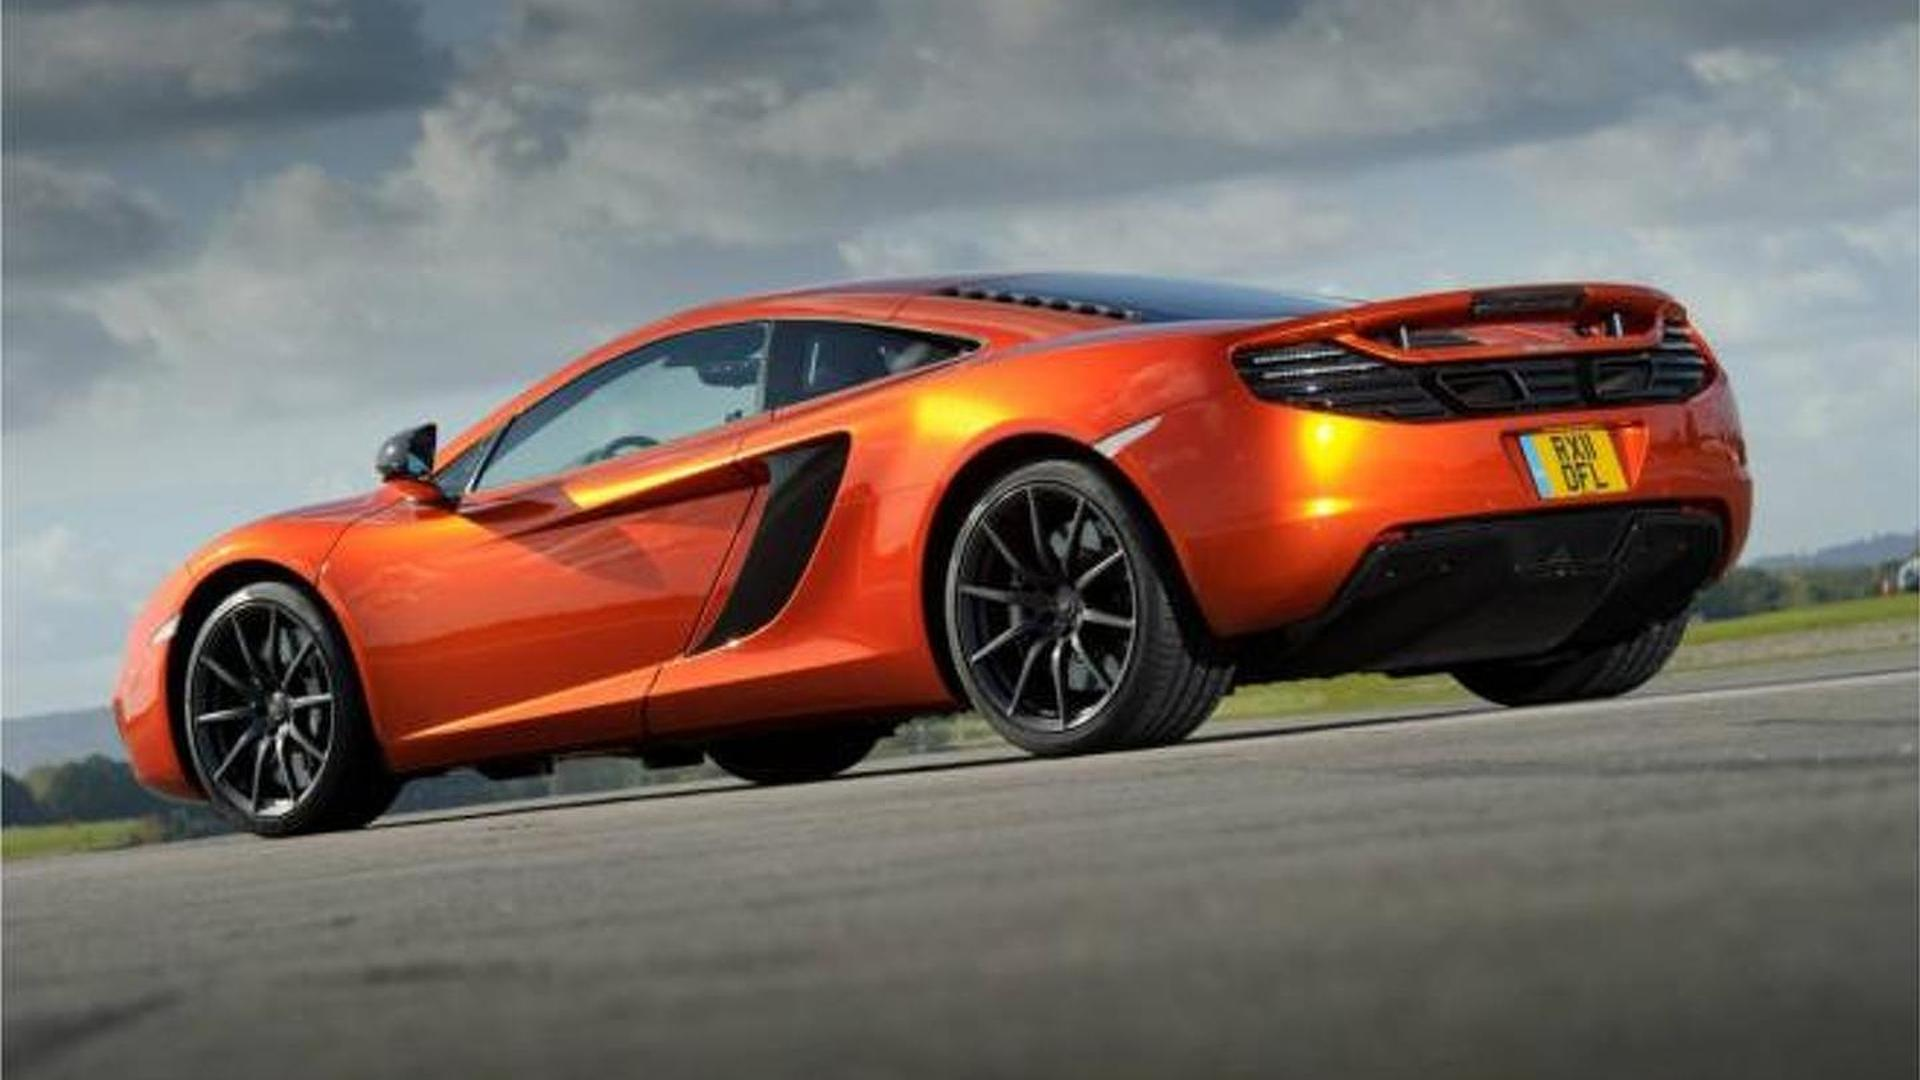 McLaren confirms entry-level model due in 2015